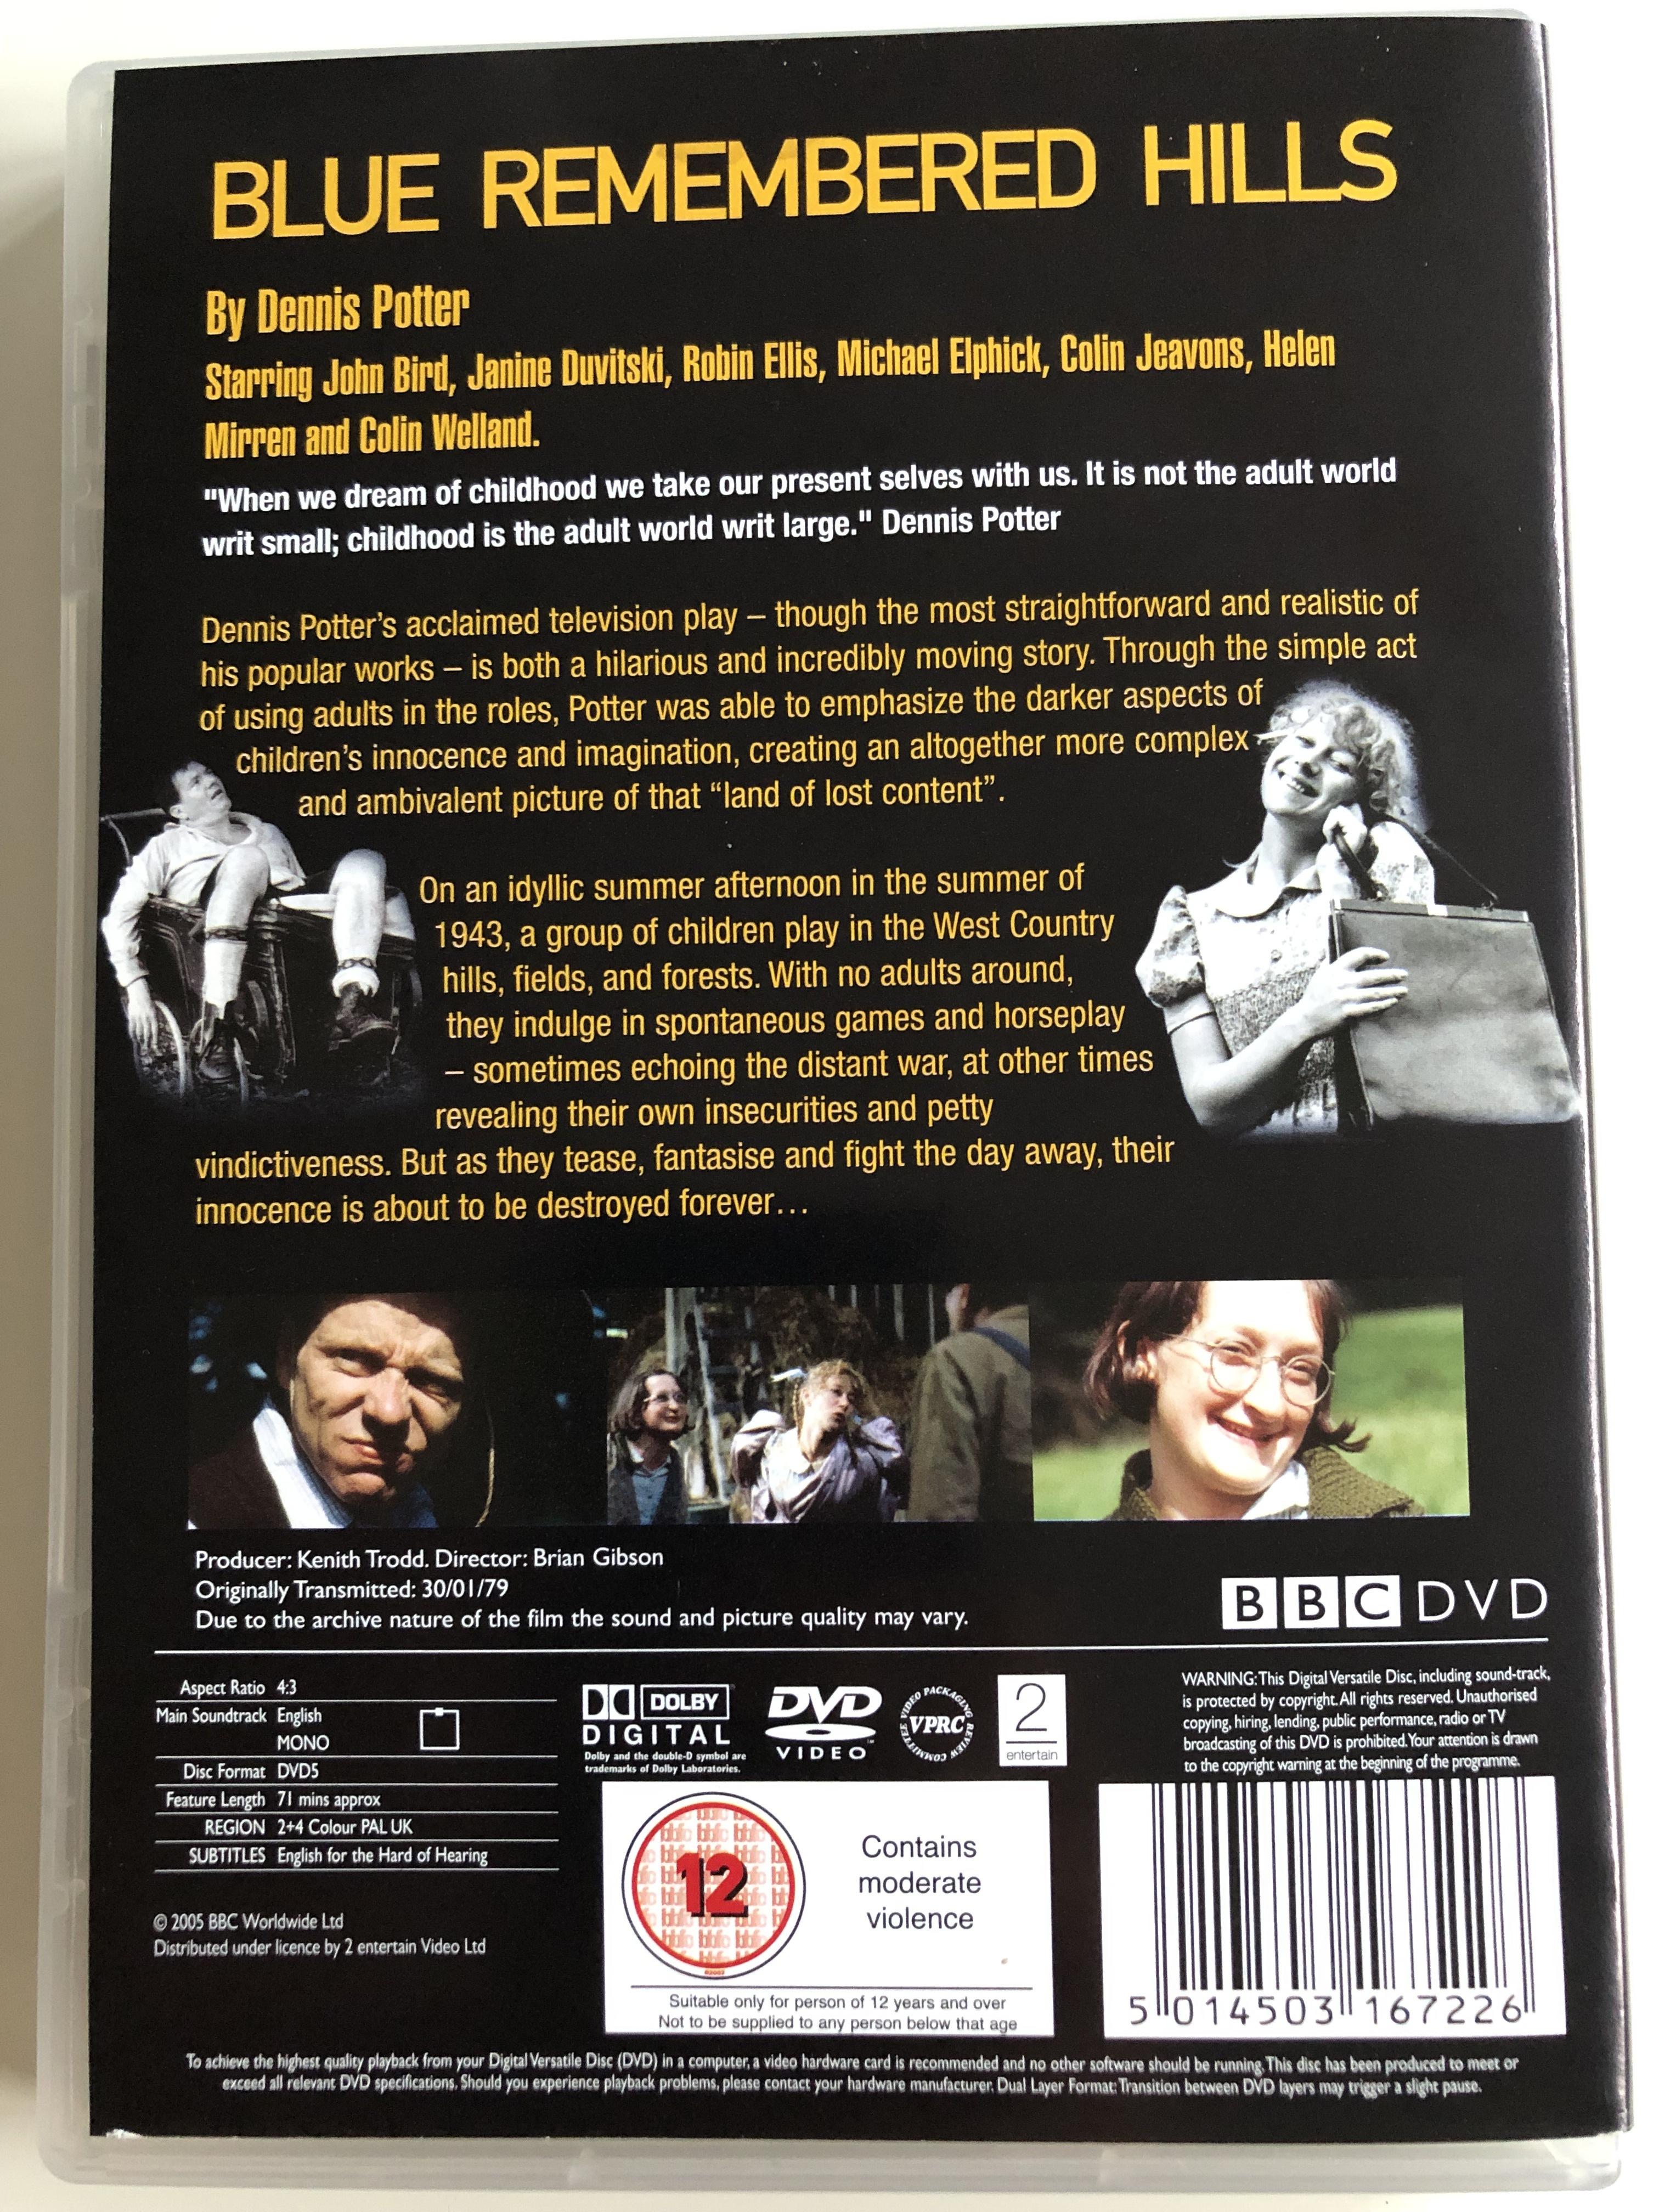 blue-remembered-hills-dvd-1979-bbc-television-play-directed-by-brian-gibson-starring-michael-elphick-robin-ellis-colin-welland-helen-mirren-janine-duvitski-colin-jeavons-john-bird-2-.jpg